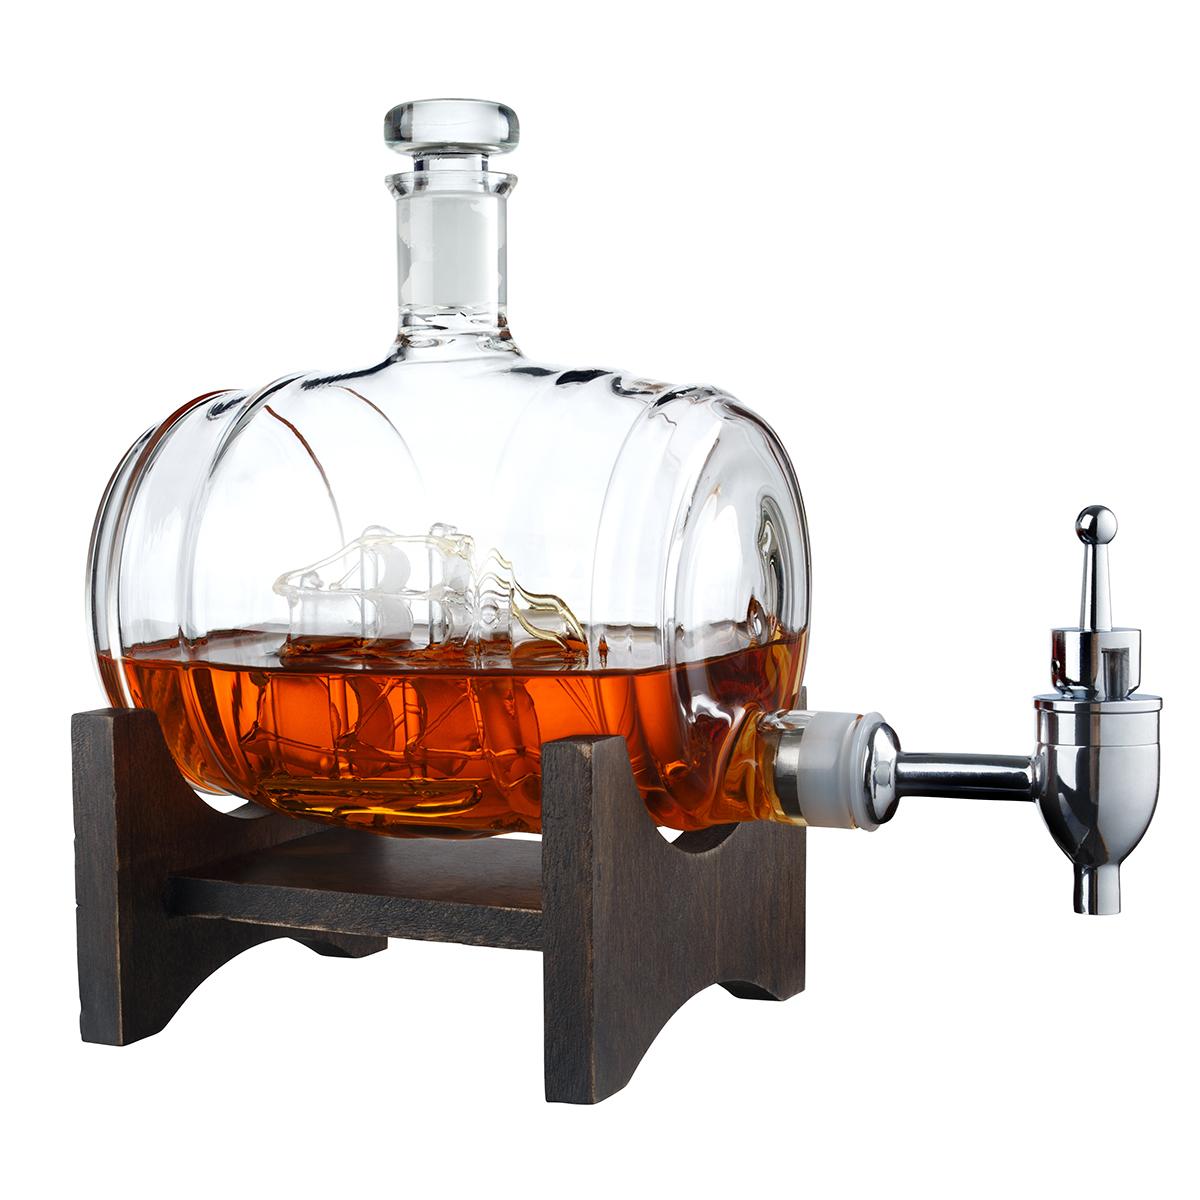 Ship in Your Bottle Spigot Decanter